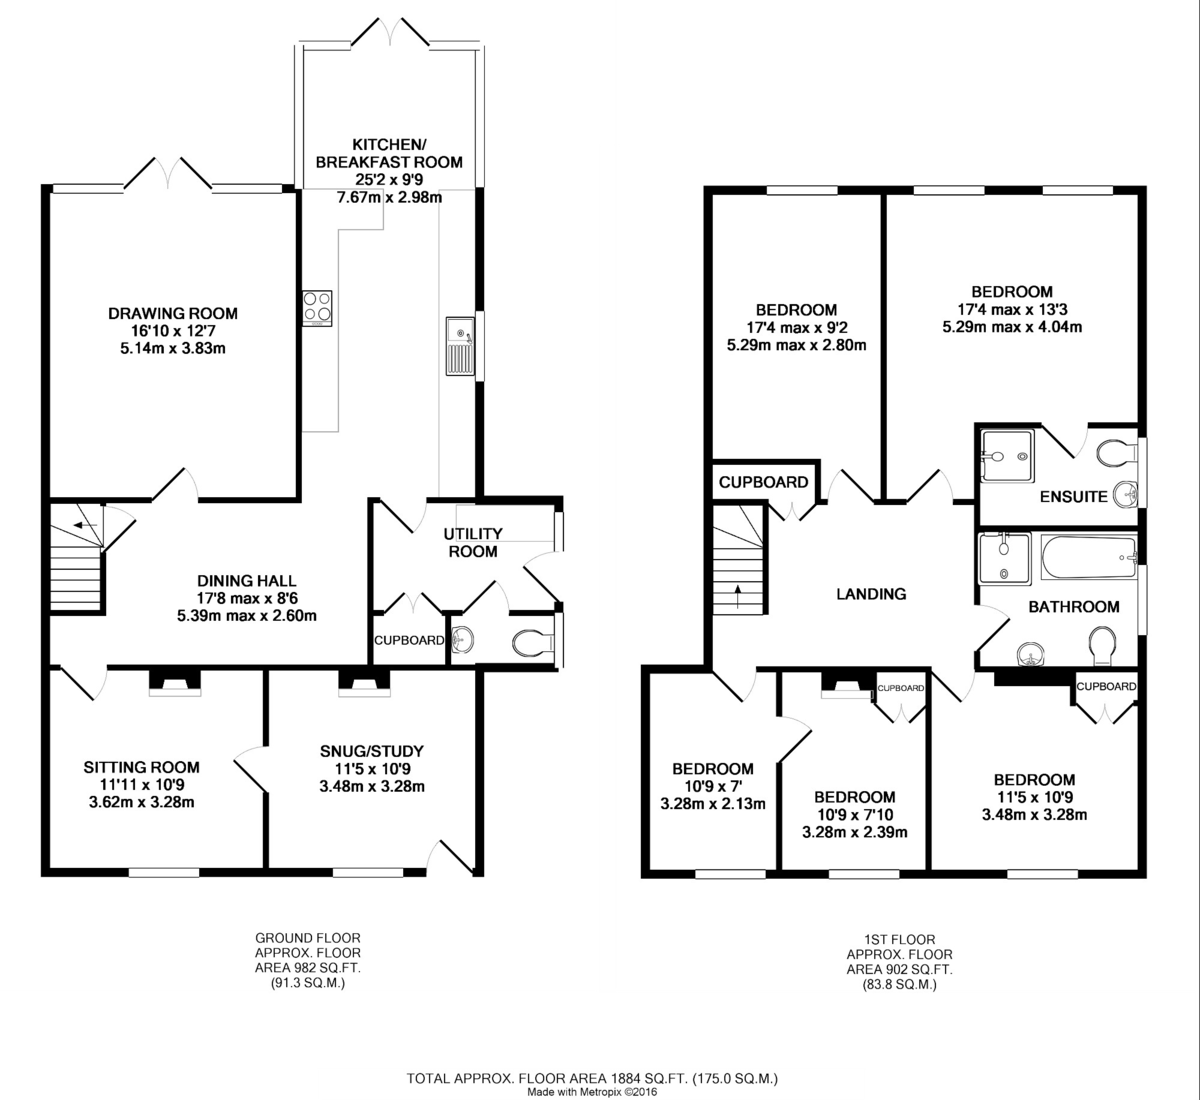 Belchamp St Paul, Sudbury, Suffolk Floorplan